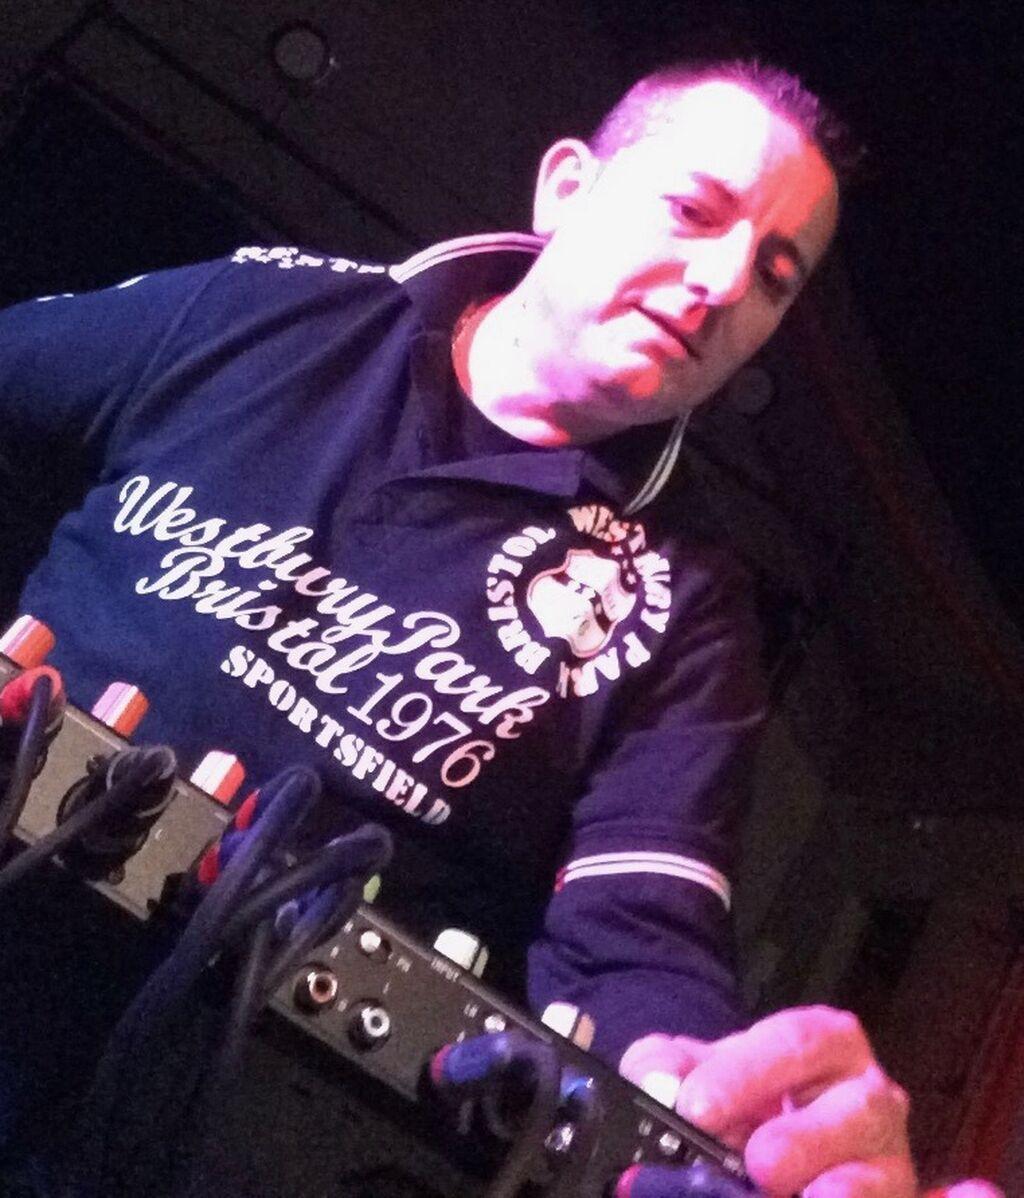 Emilio DJ Superlópez